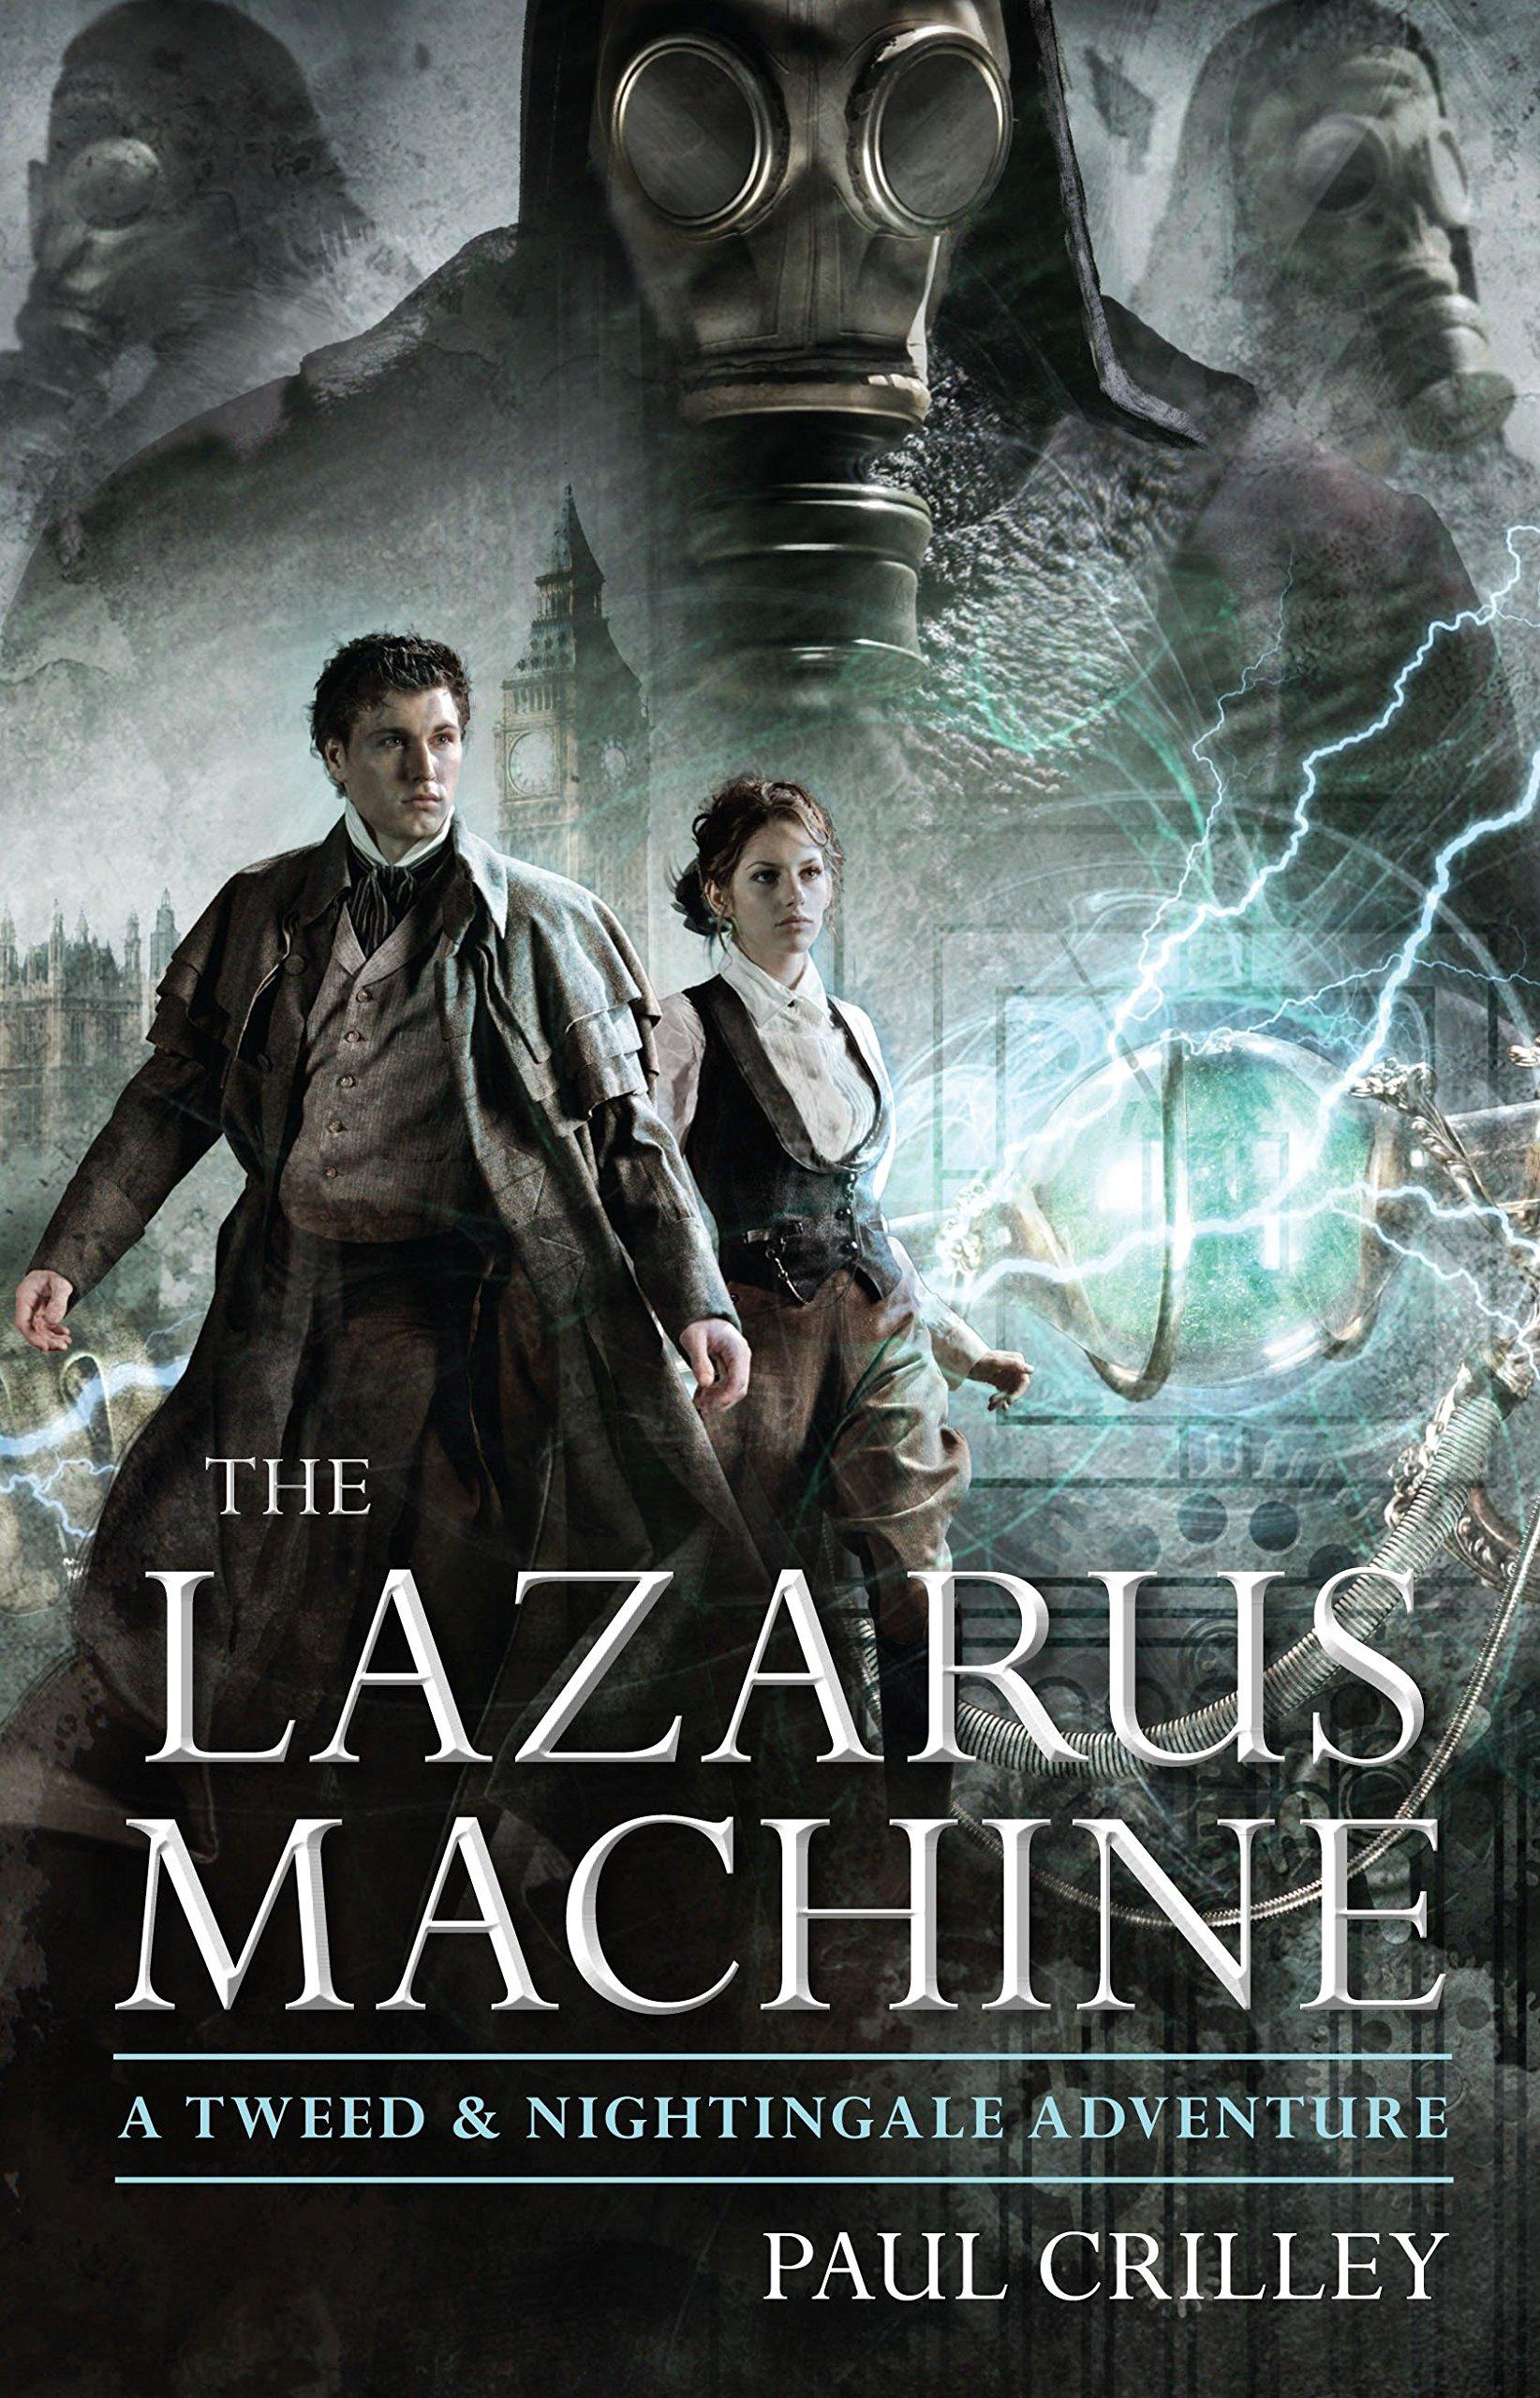 Download The Lazarus Machine (Tweed and Nightingale Adventures) ebook